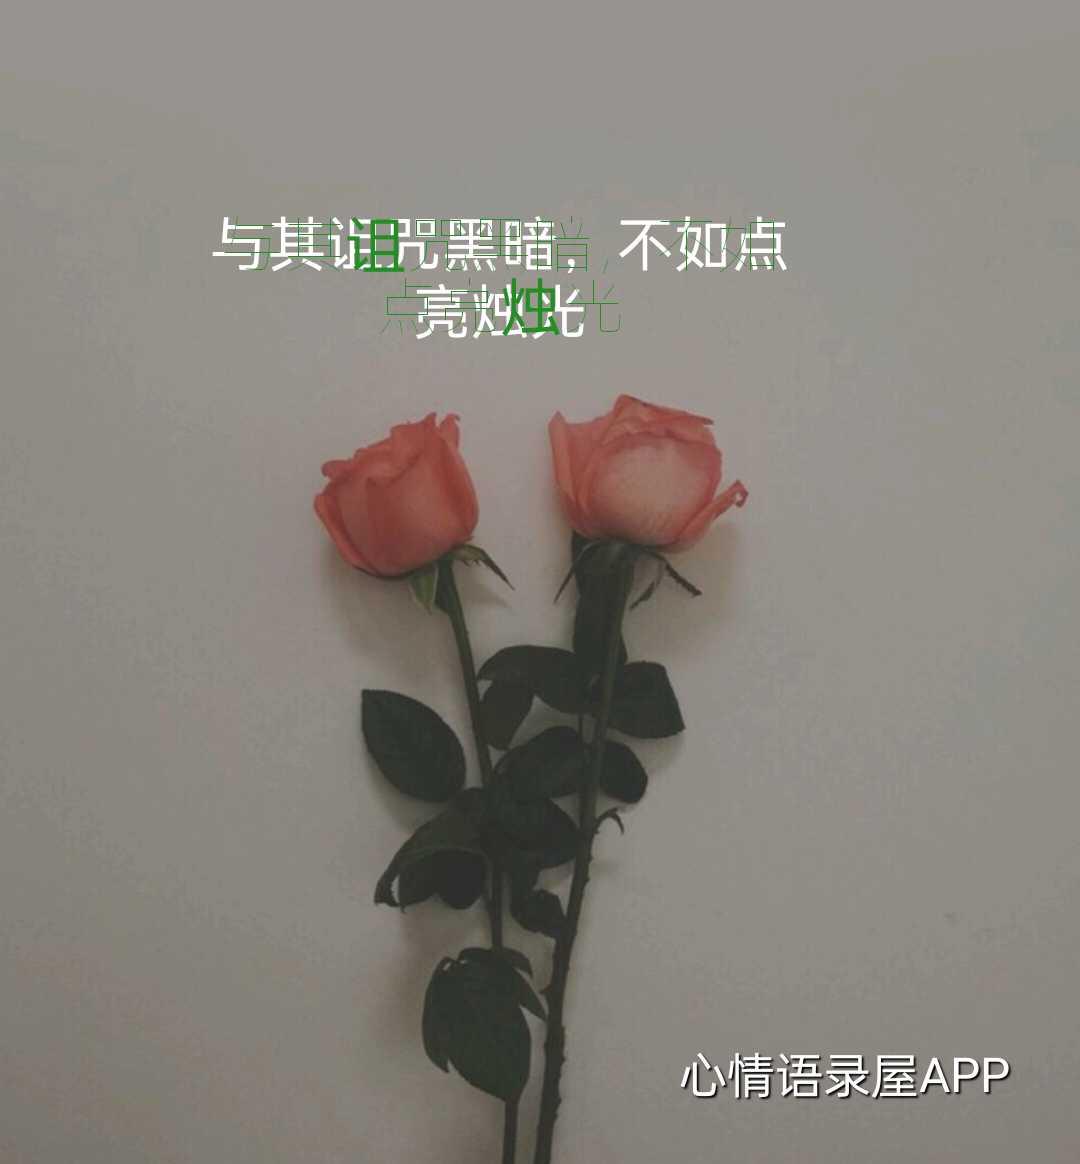 http://www.58100.com/index/detail/763256